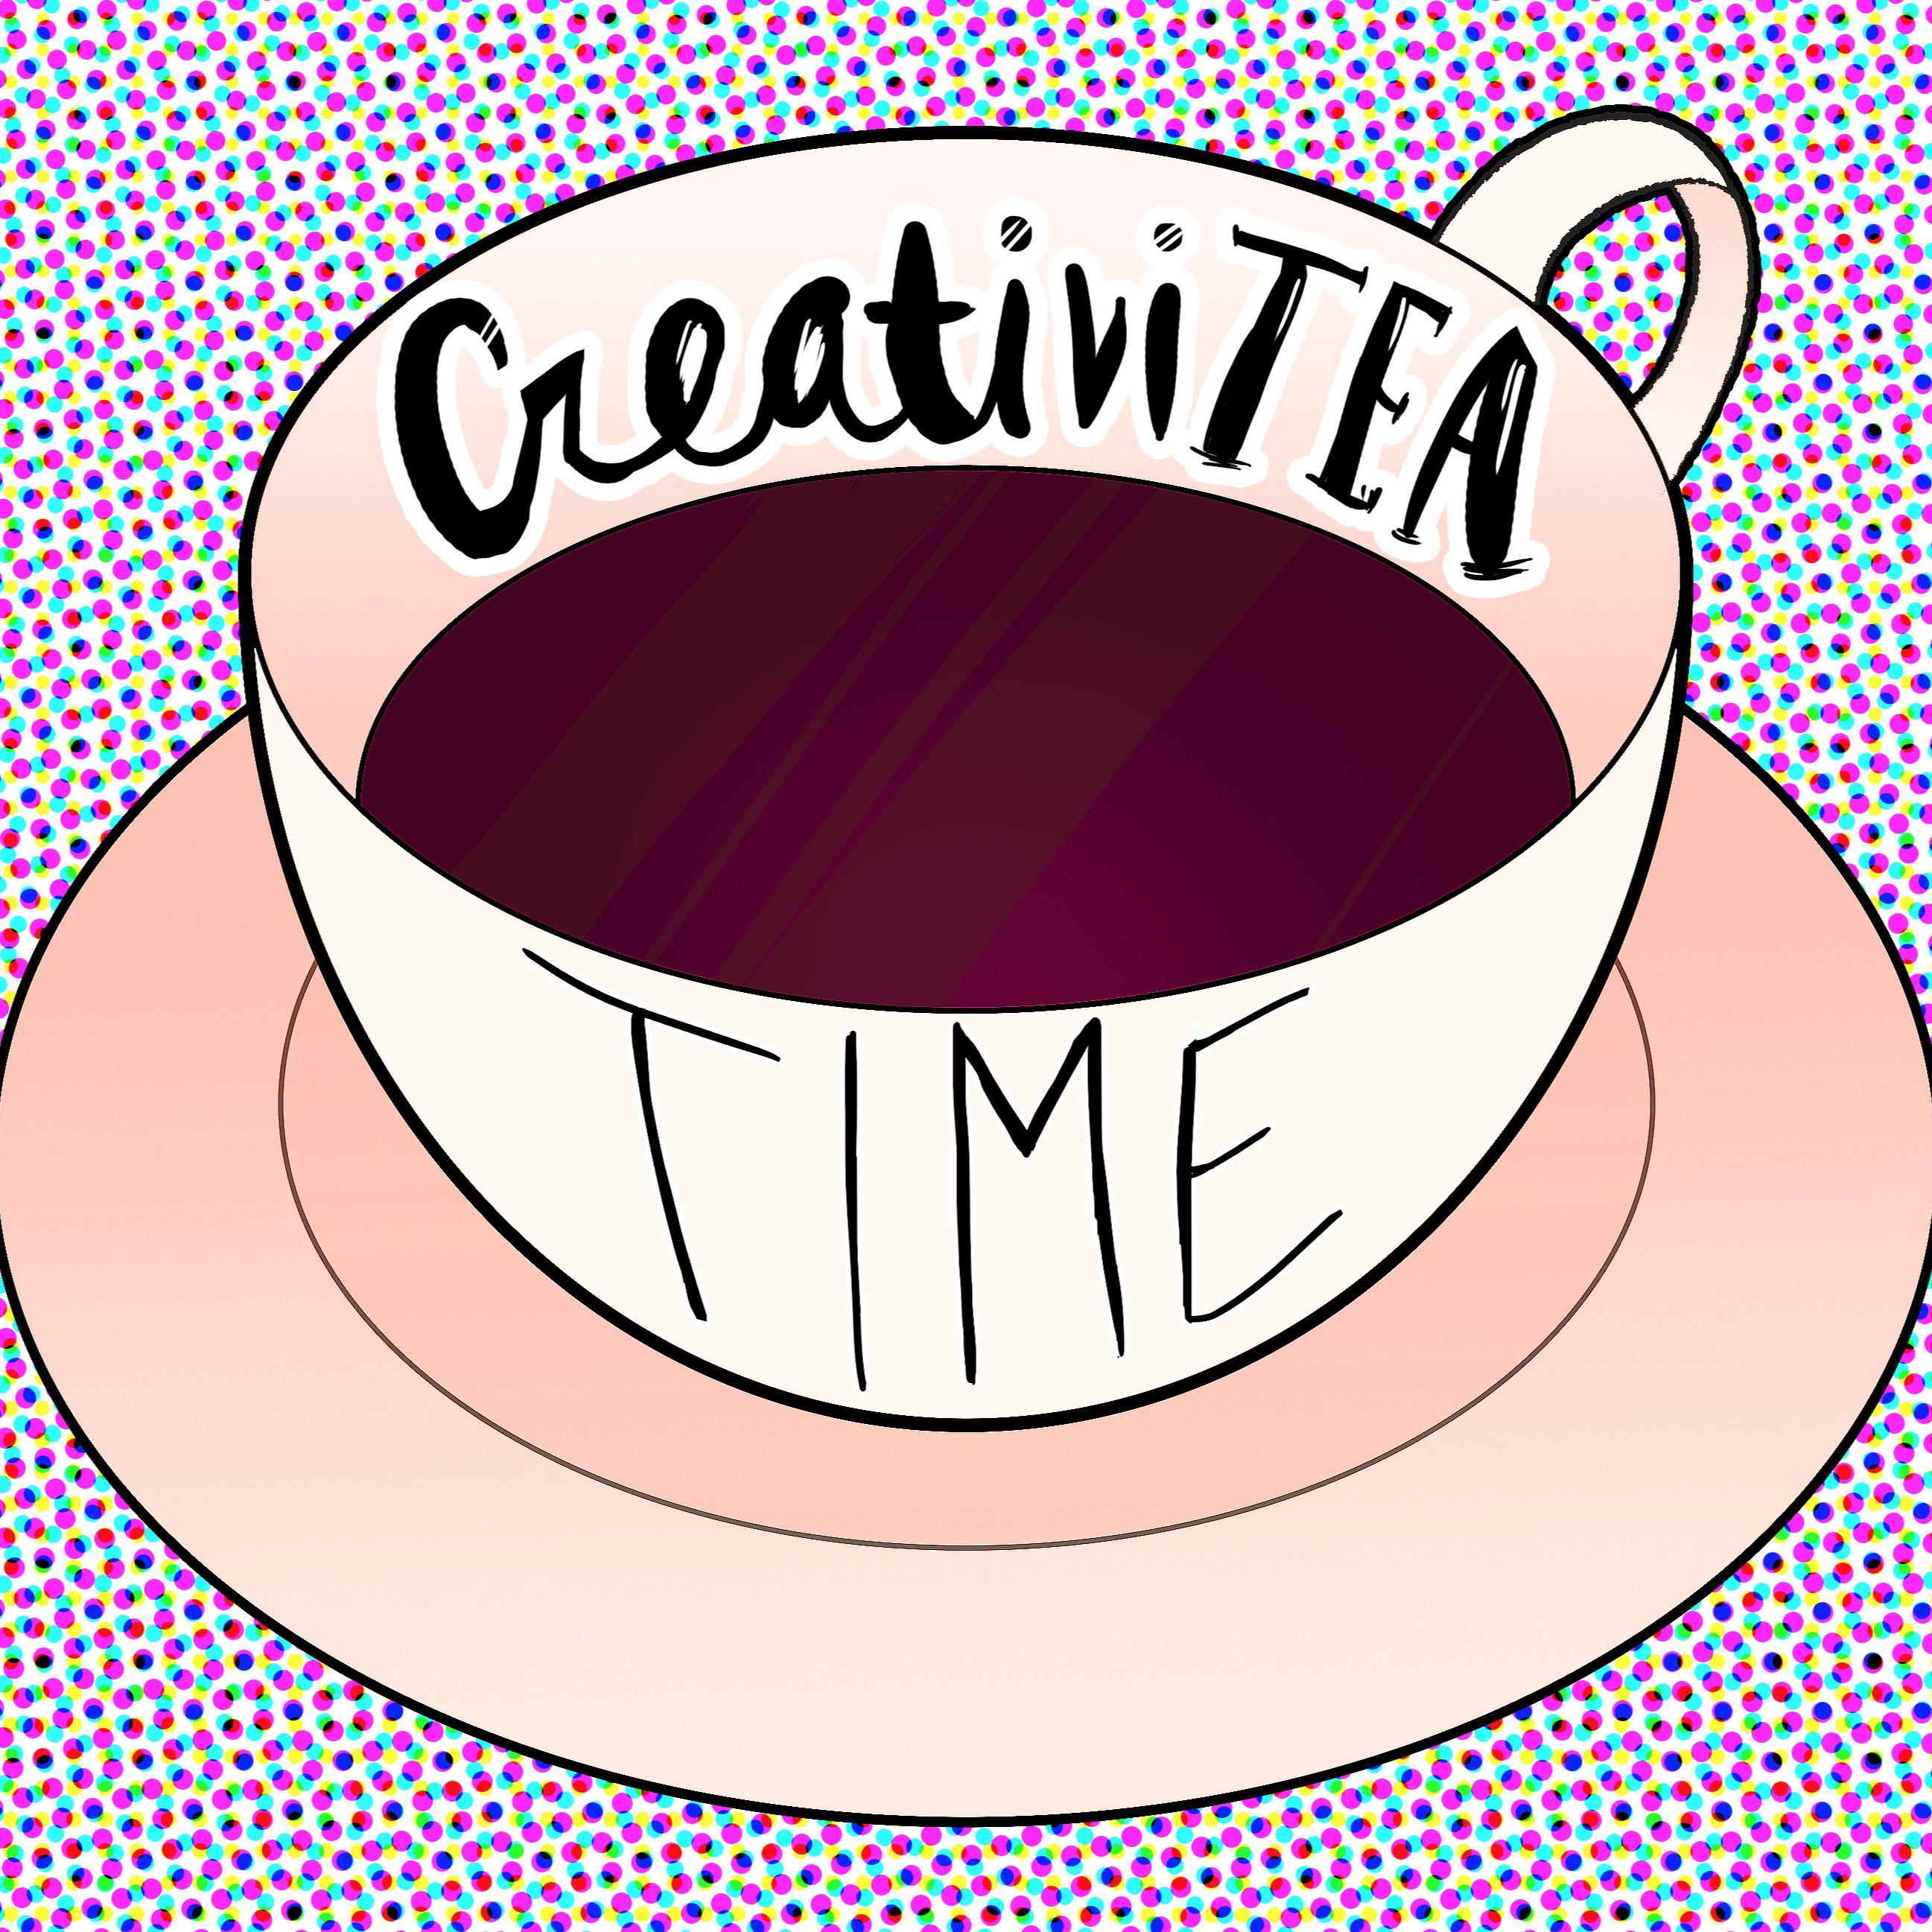 CreativiTEAtime